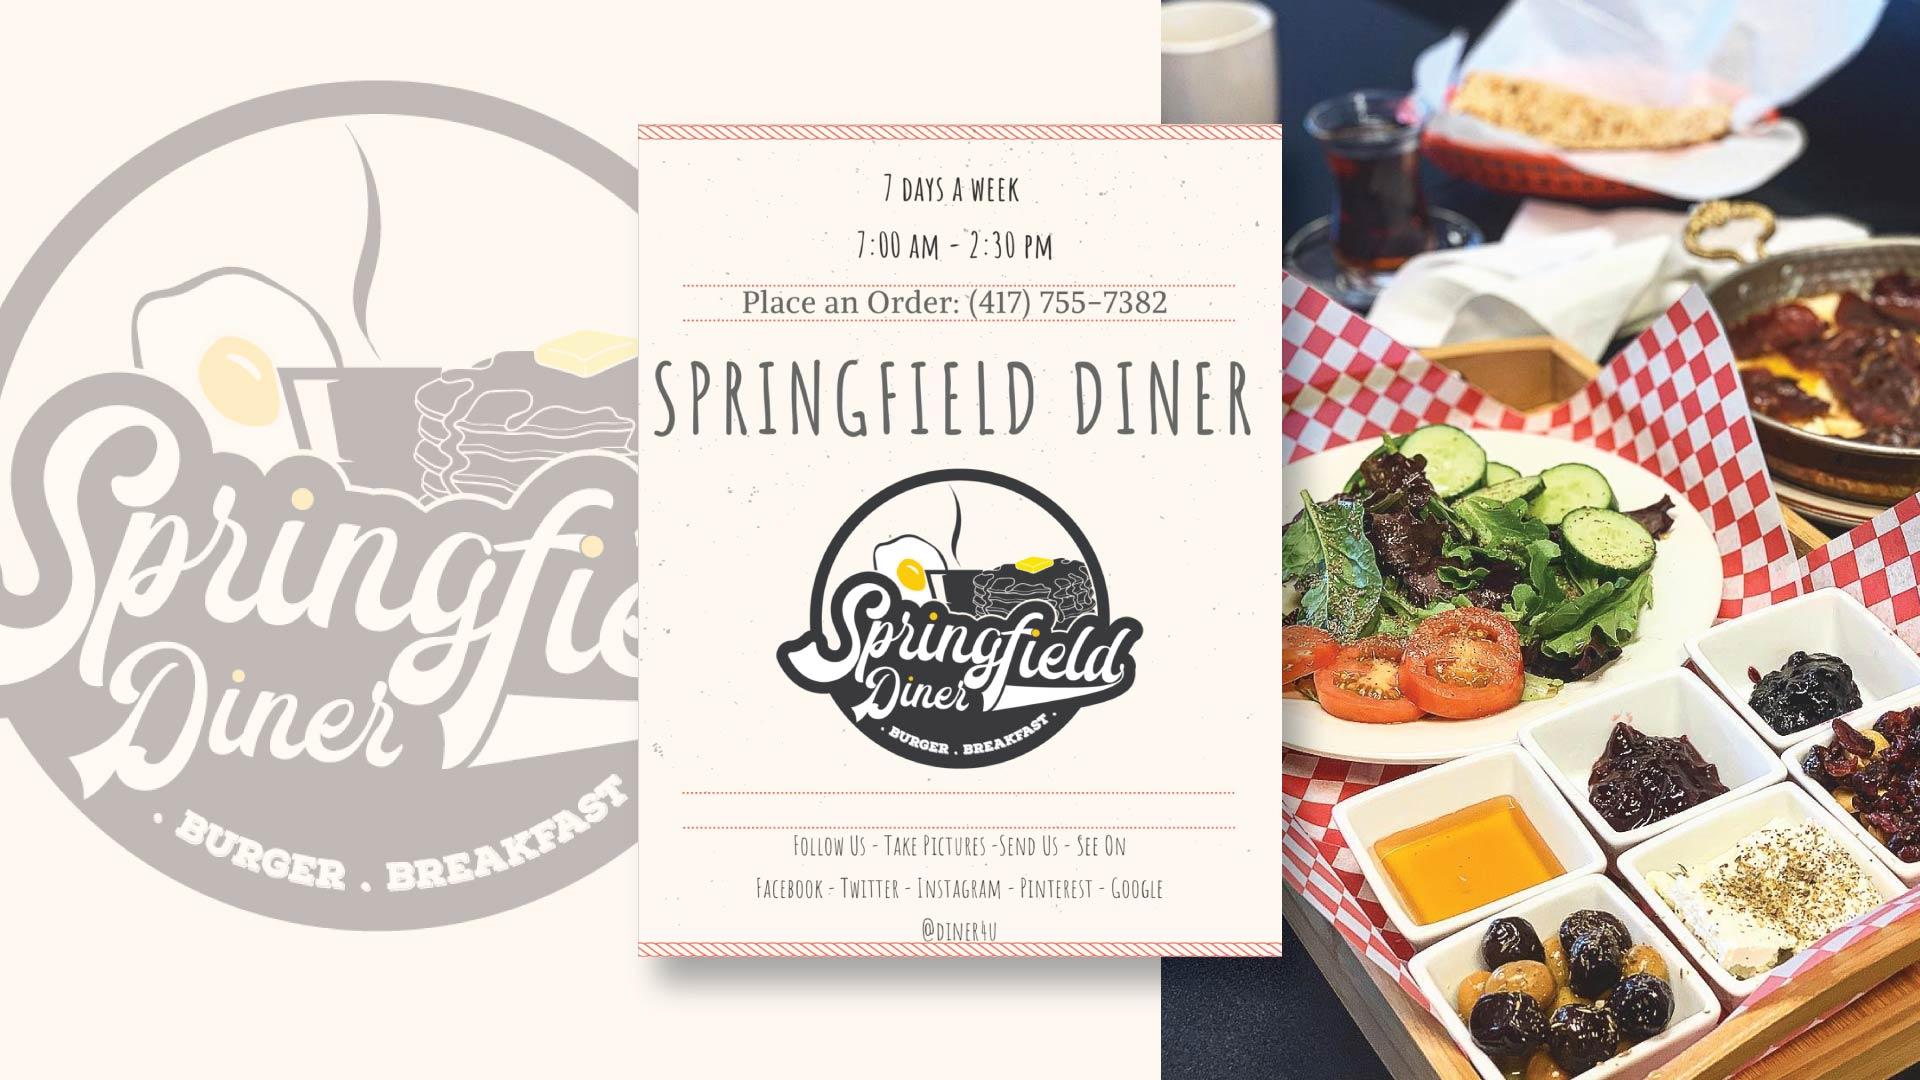 springfield-diner-01